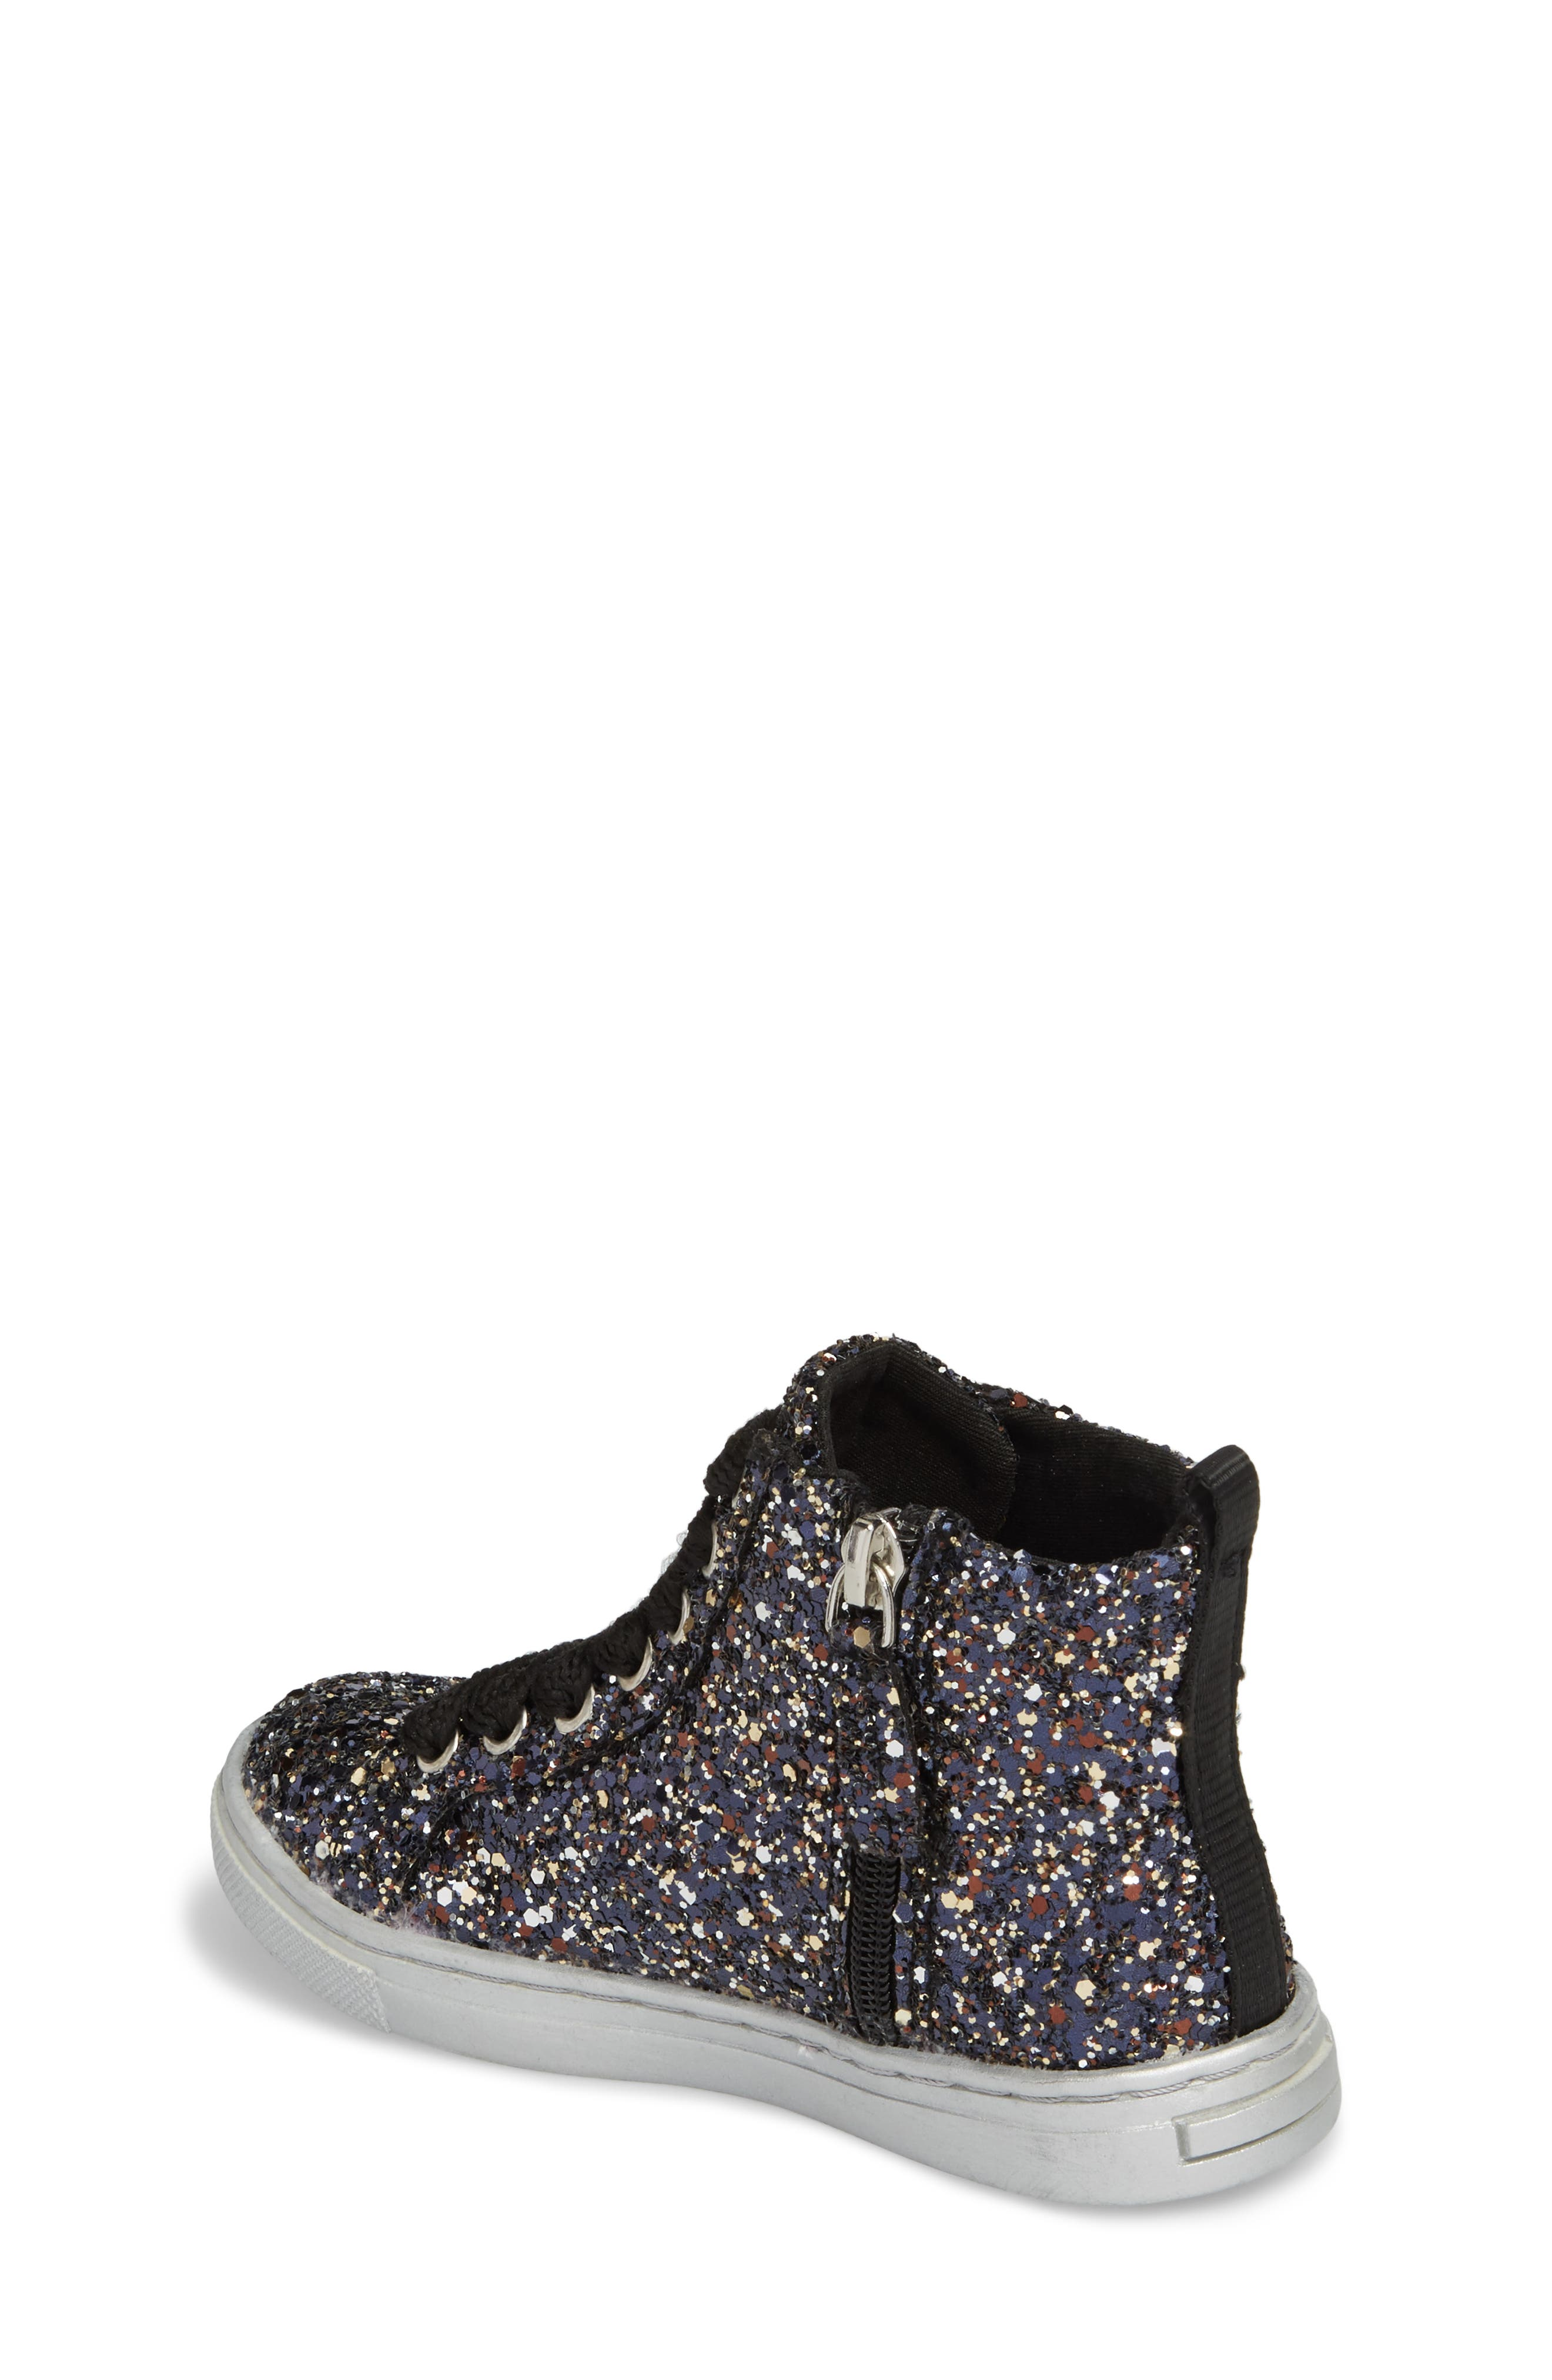 Zaine Glittery High Top Sneaker,                             Alternate thumbnail 2, color,                             Black Multi Glitter